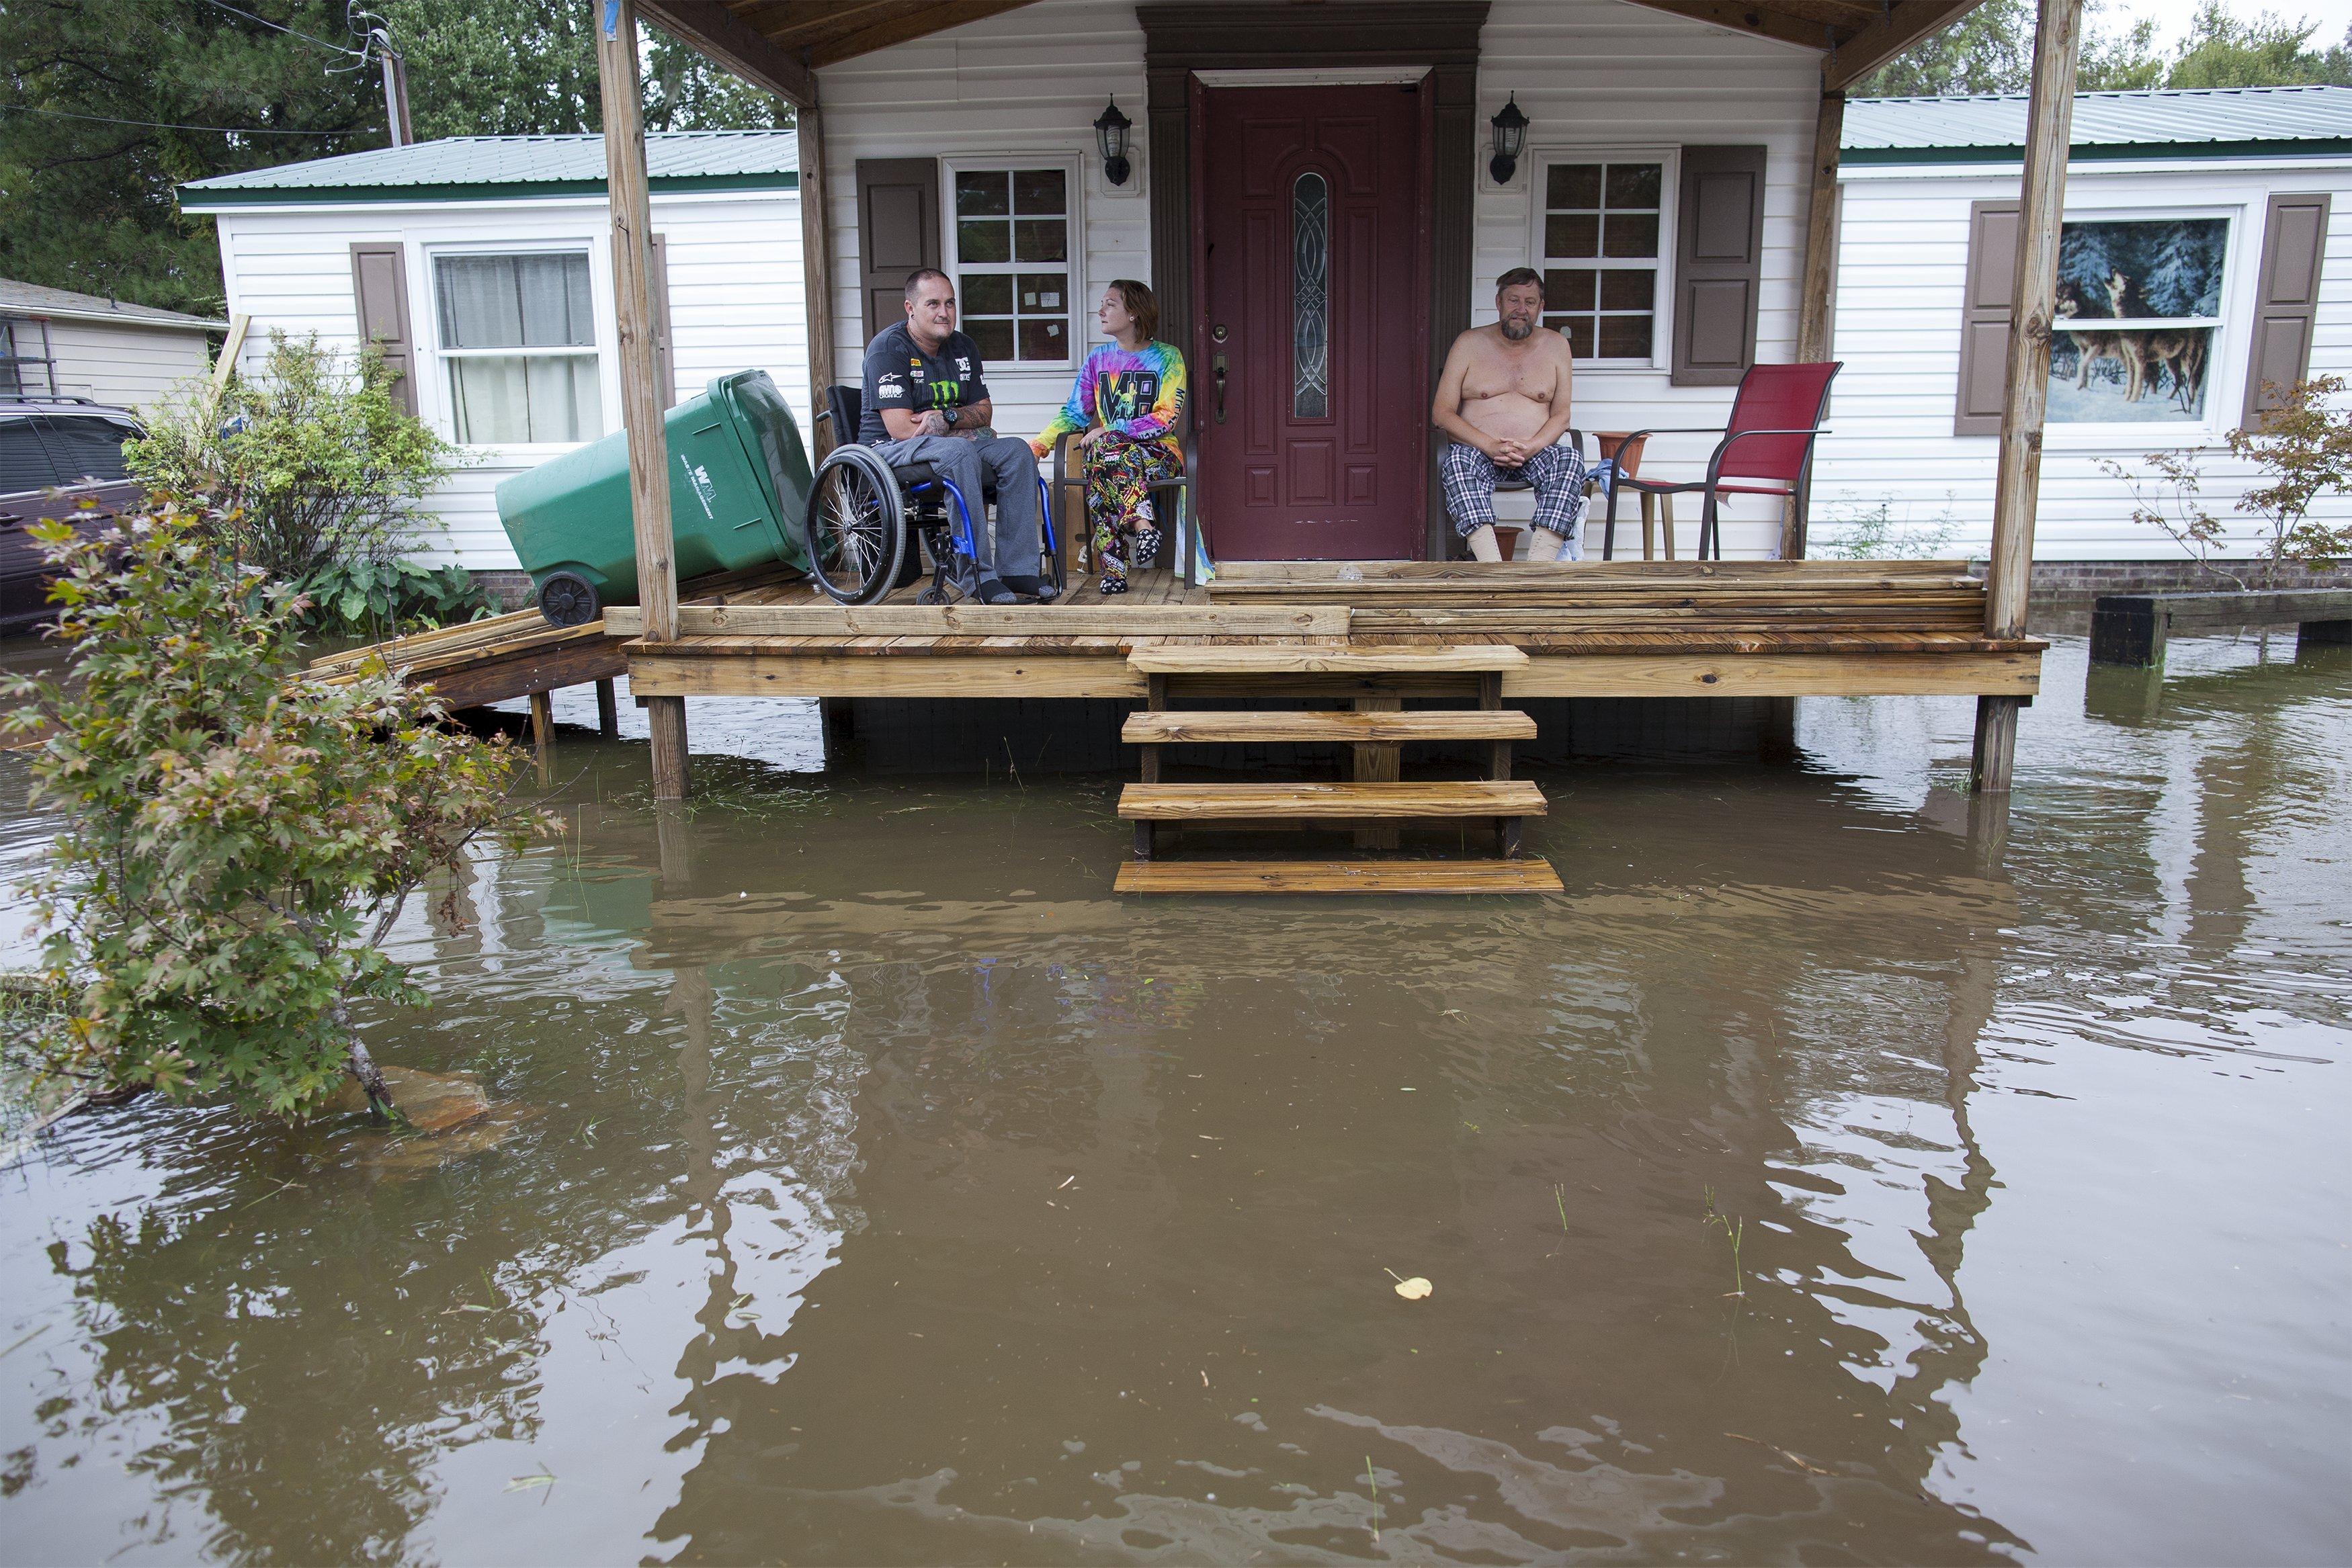 Chris Stumbo (kiri-kanan), kekasihnya Felicia Howerton dan Paul Stumbo memantau tinggi air banjir yang mengepung rumah mereka di Applewood Court di Myrtle Beach, Carolina Selatan, Senin (5/10). Hujan lebat yang menurut gubernur Carolina Selatan hujan-sekali-seabad menyebabkan banjir di negara bagian tenggara Amerika Serikat kemarin, dan menewaskan delapan jiwa di Carolinas. ANTARA FOTO/REUTERS/Randall Hill.